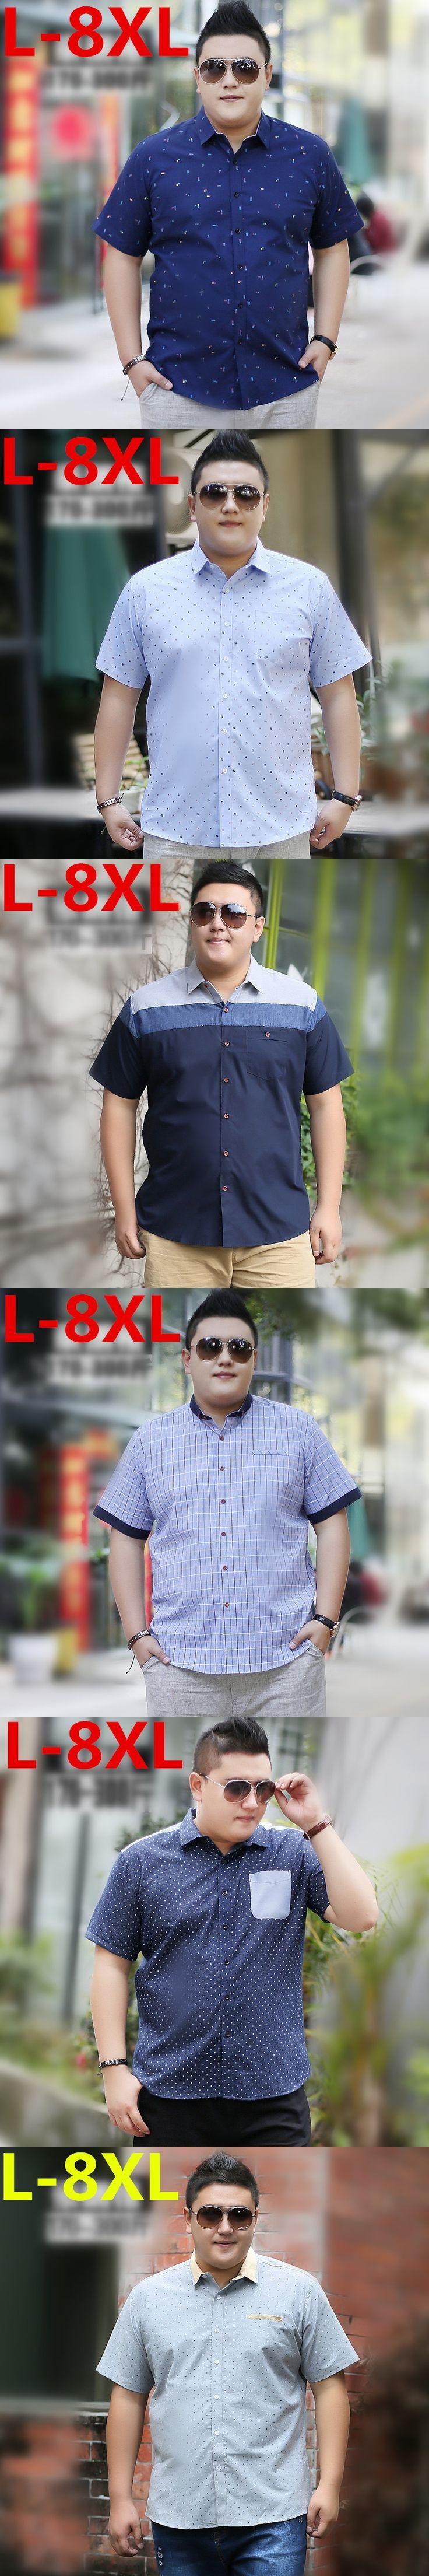 2017 new  plus size Men Trendy Short Sleeve Fit Pattern Print Summer Casual Button Down 8XL 7XL 6XL 5XL 4XL 3XL Shirts